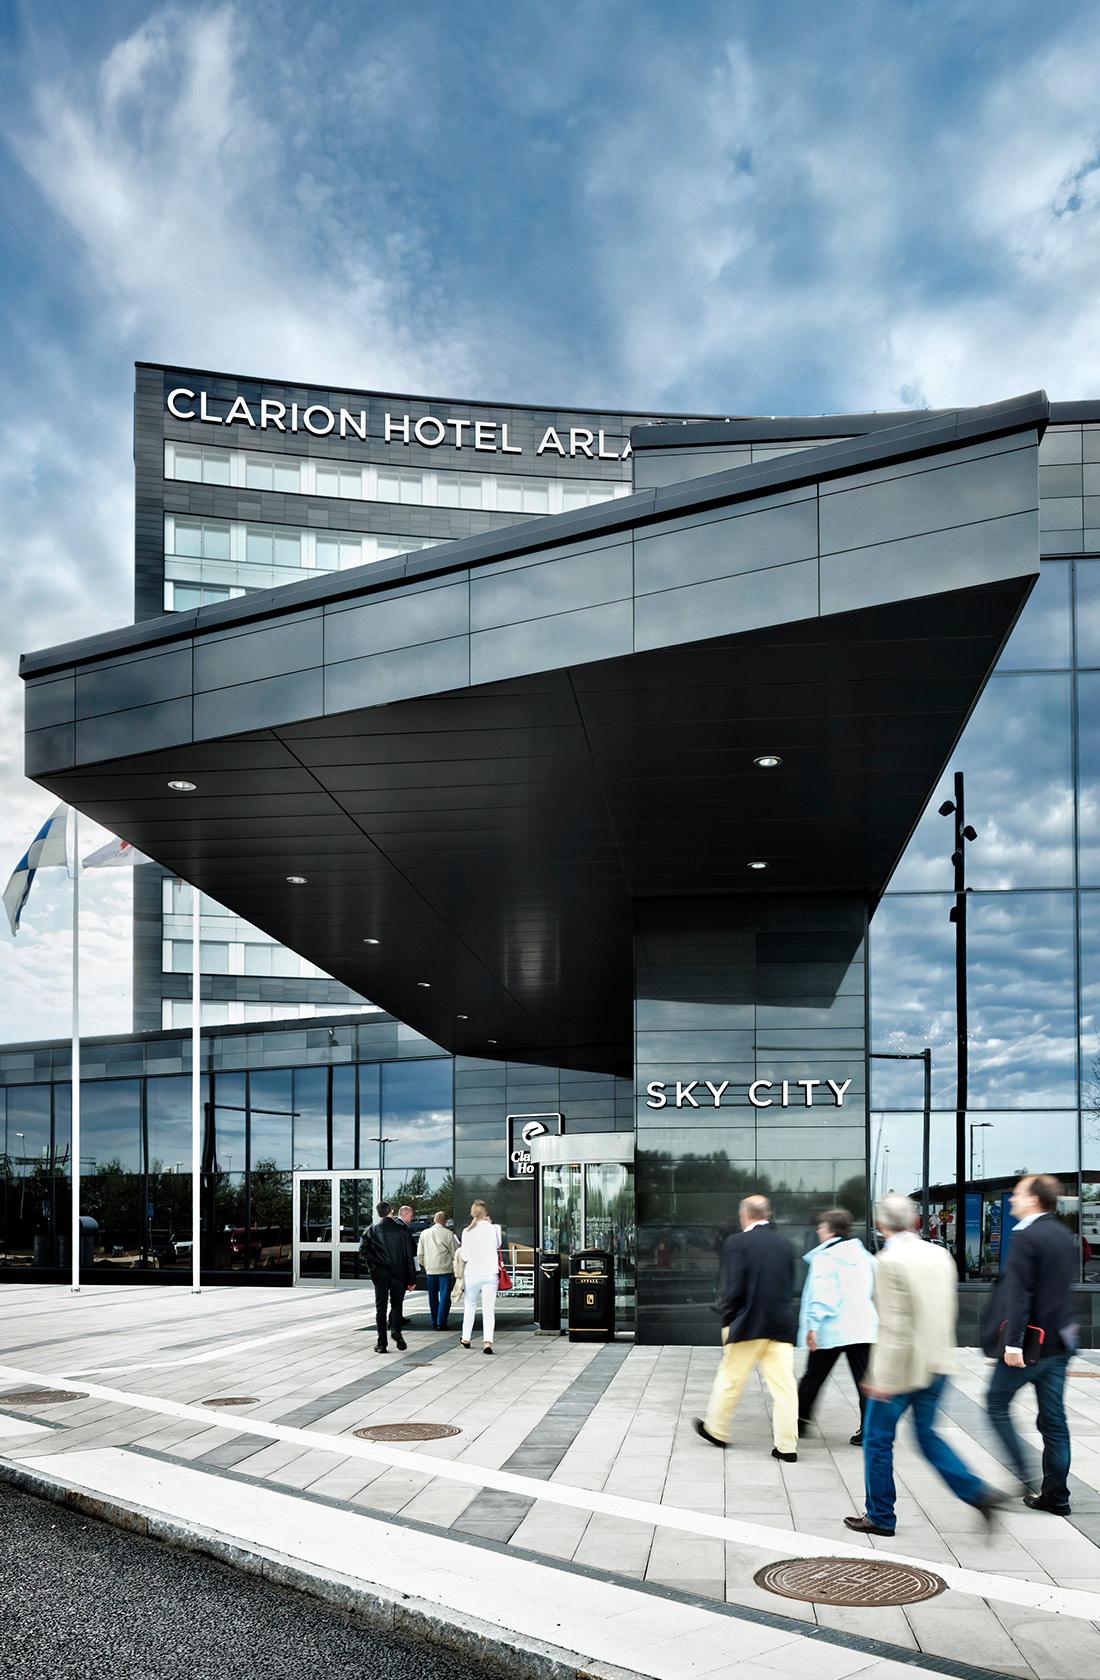 Entré till Clarion hotel Arlanda